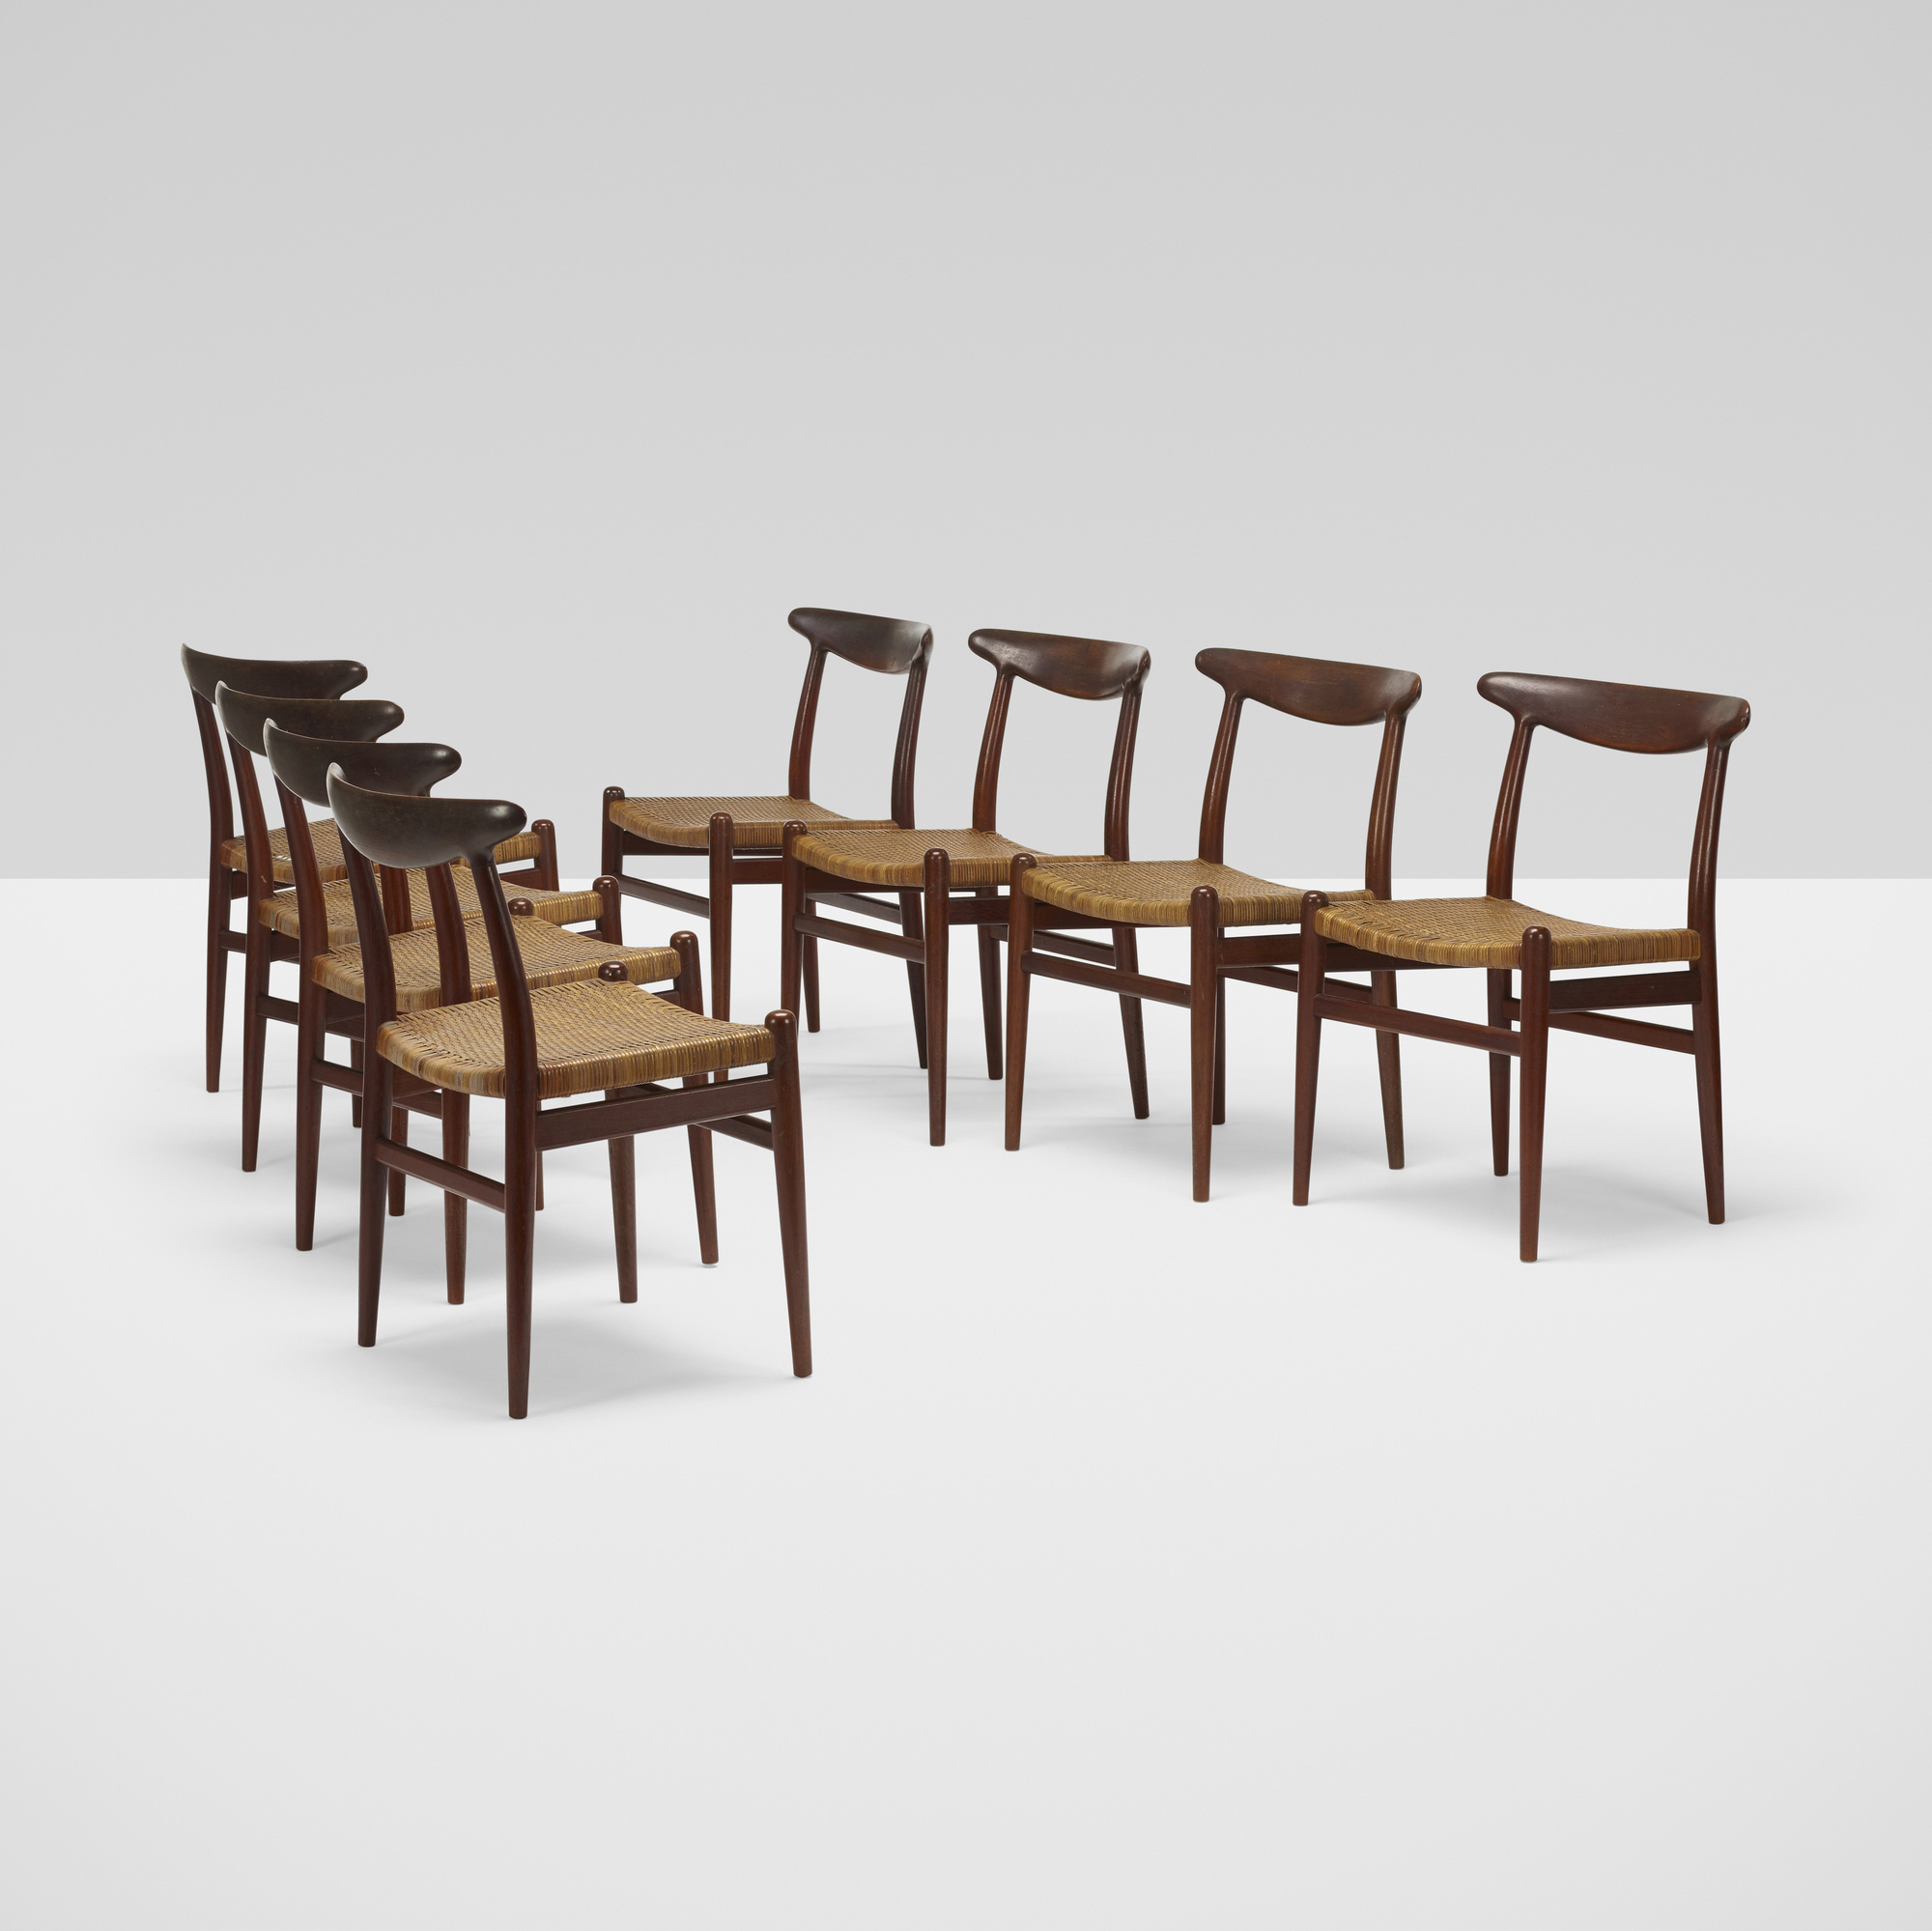 380: Hans J. Wegner / dining chairs, set of eight (1 of 5)